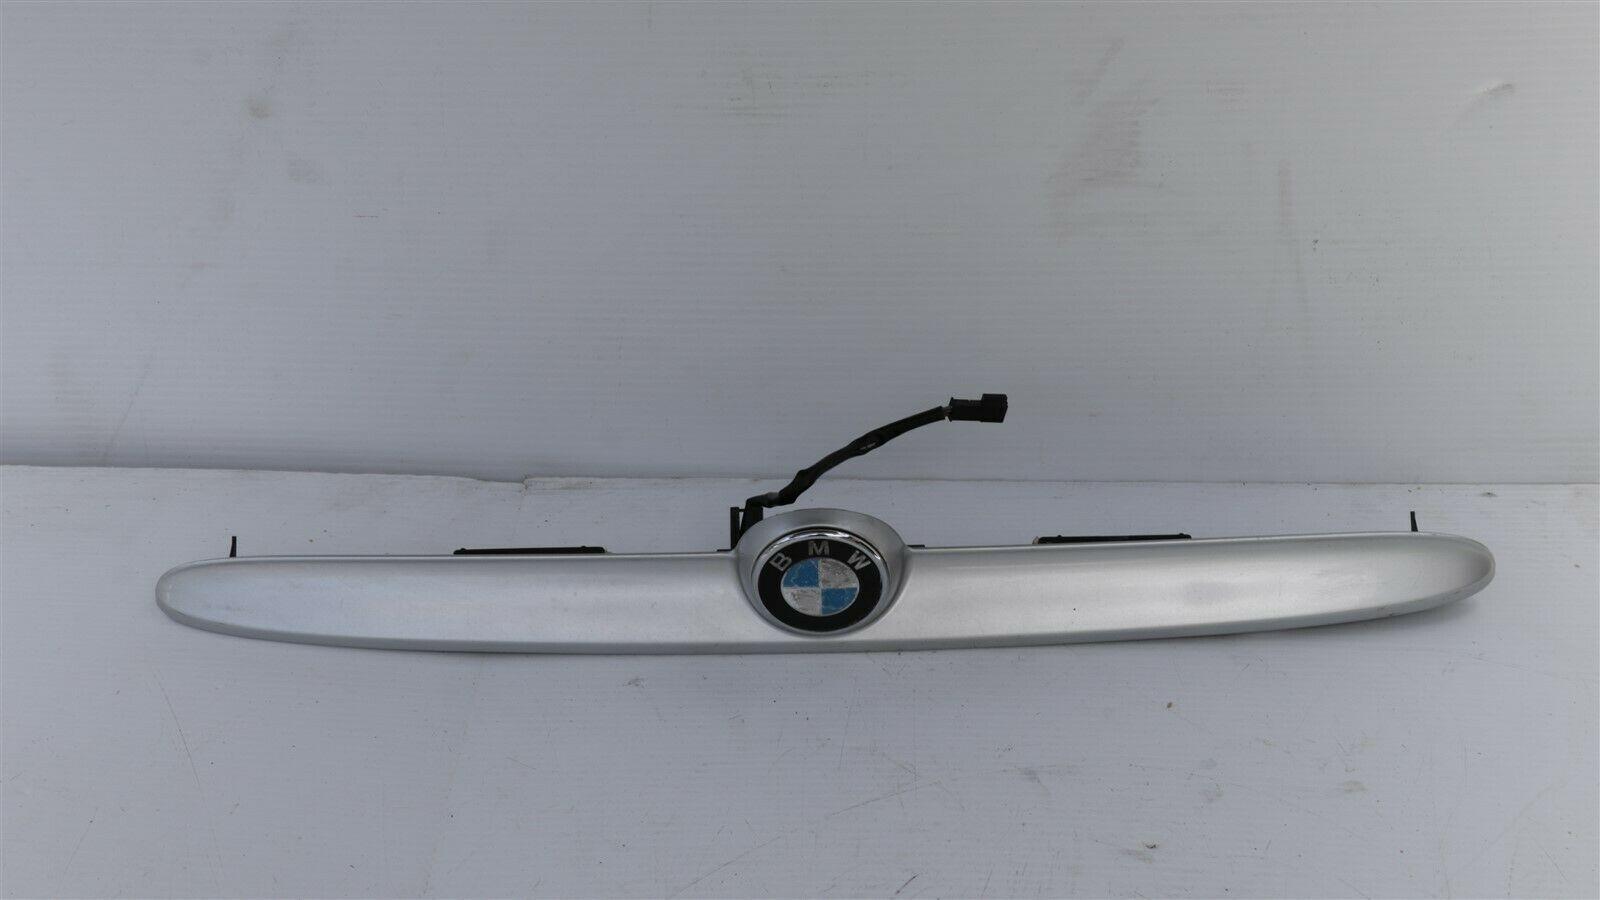 01-06 BMW E46 Convertible M3 325Ci 330Ci License Tag Light Trunk Trim Handle